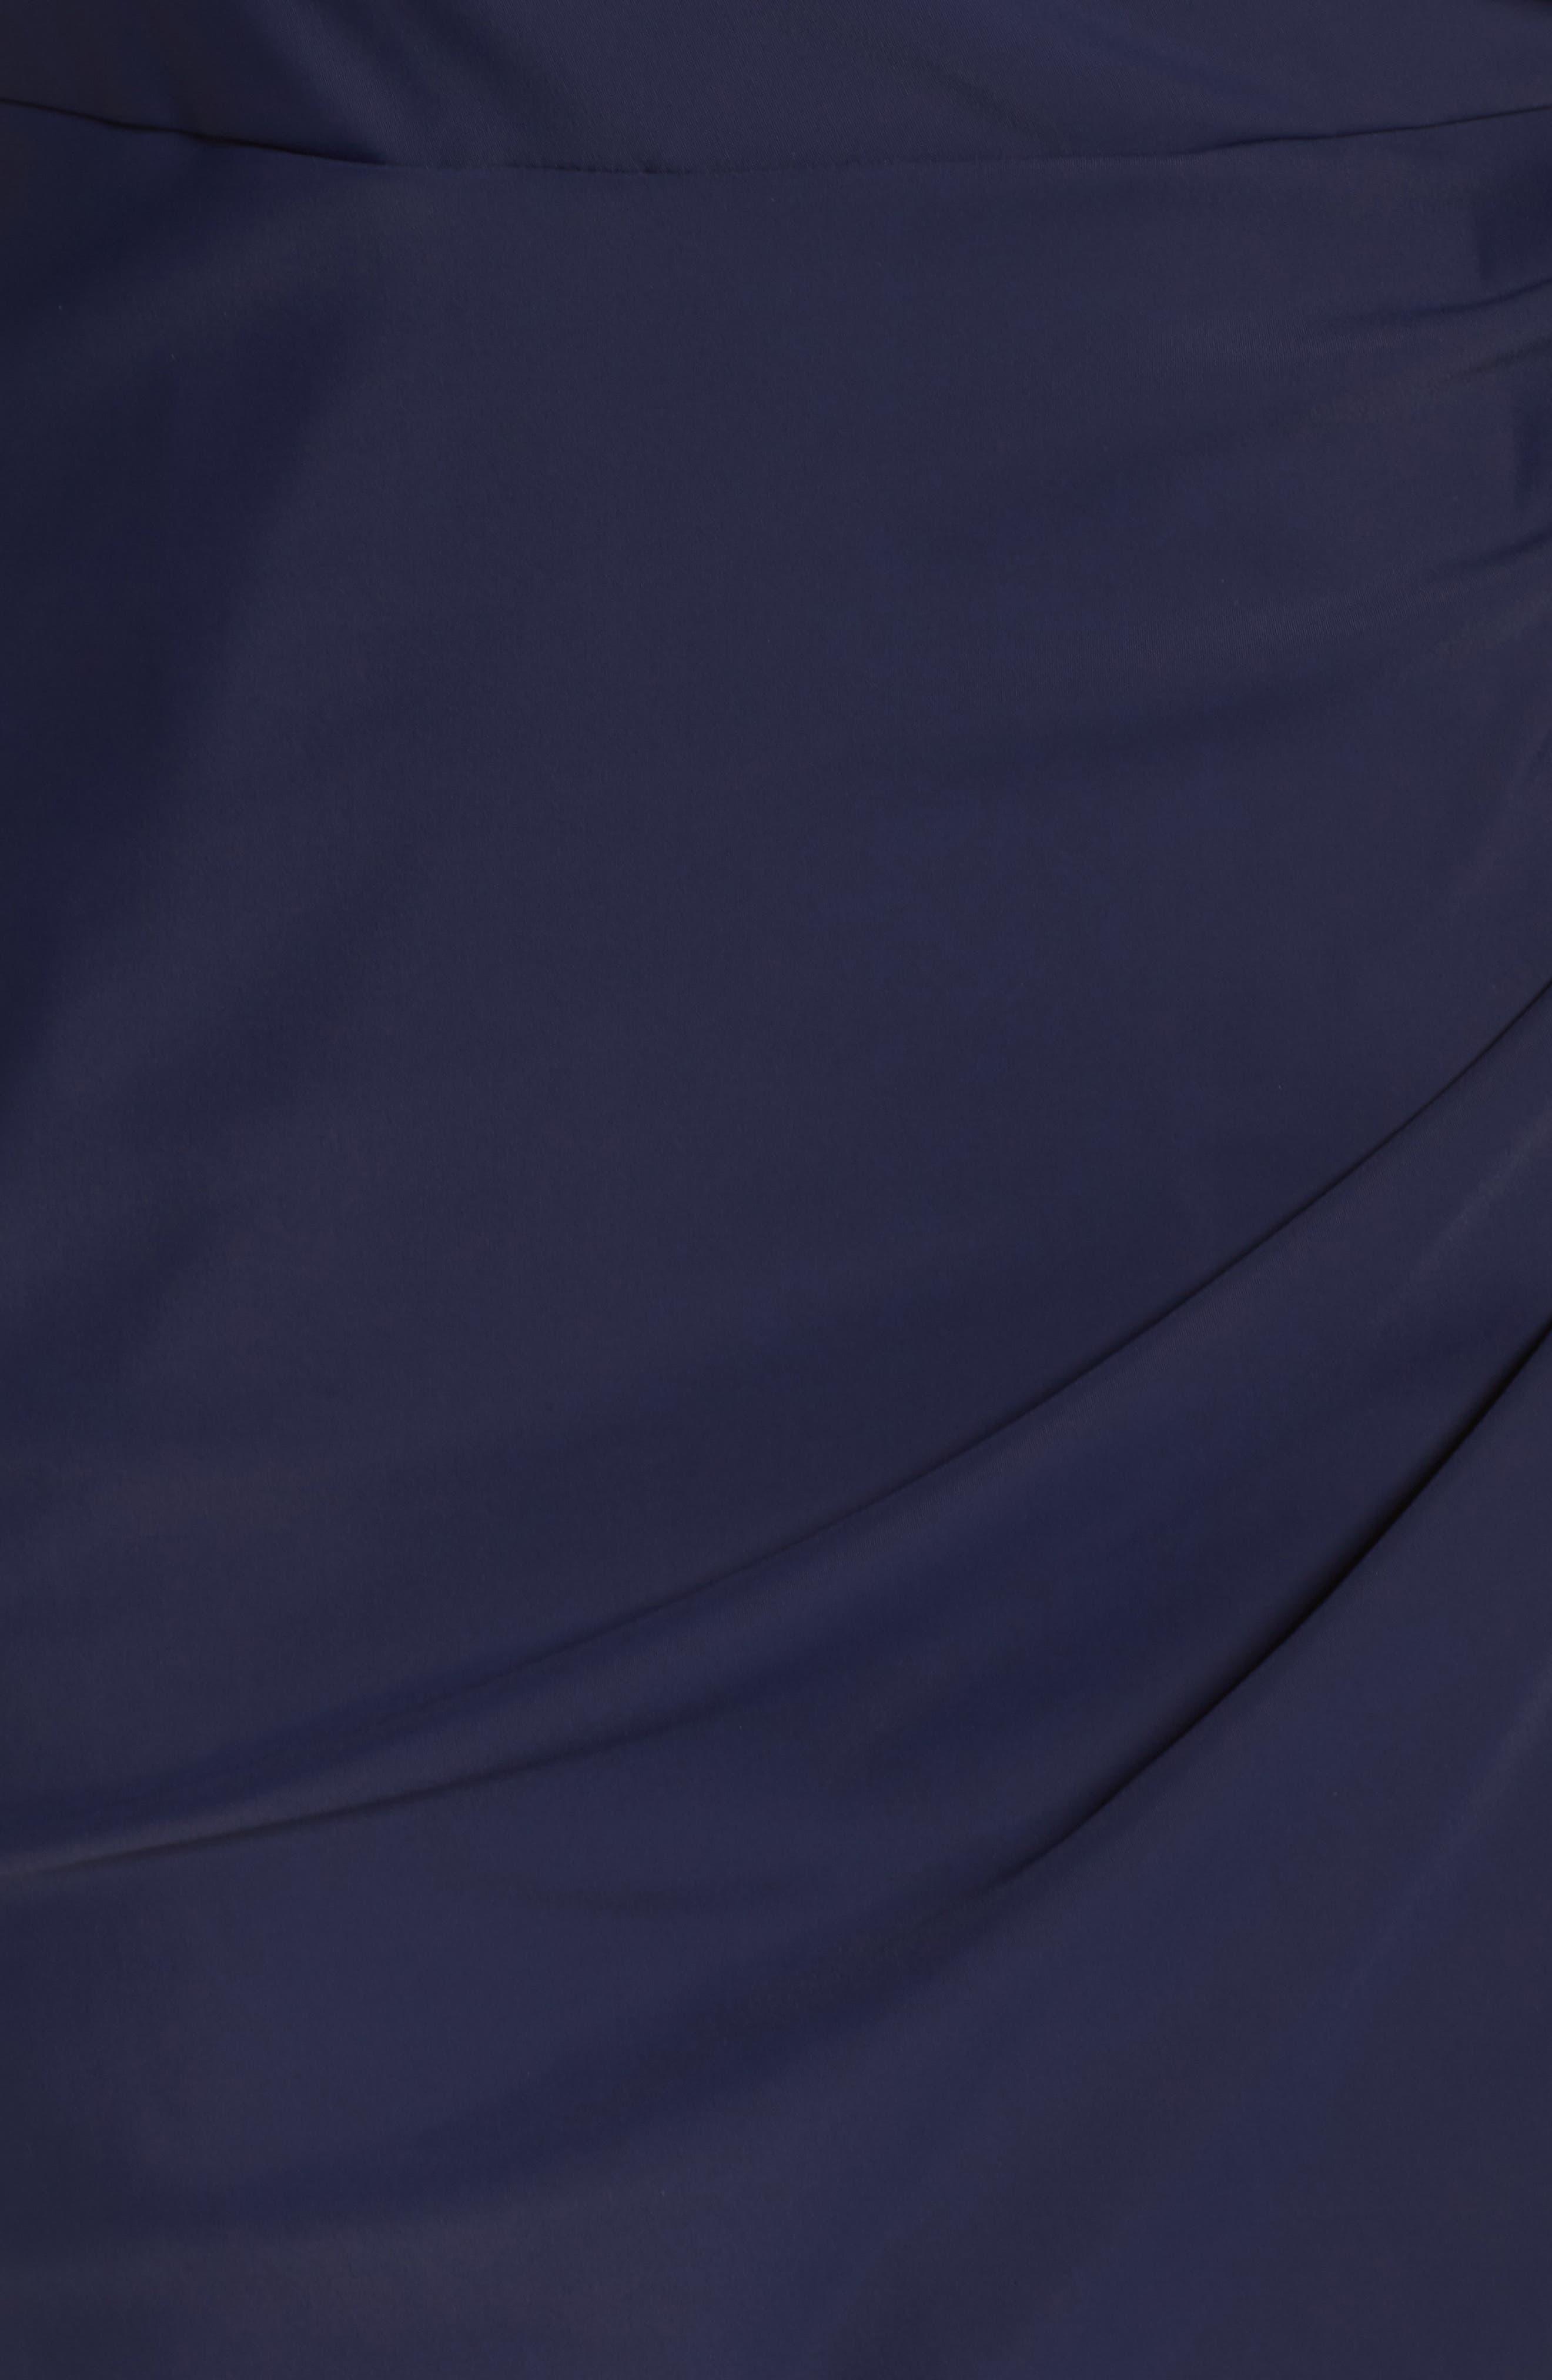 Embellished Surplice Sheath Dress,                             Alternate thumbnail 31, color,